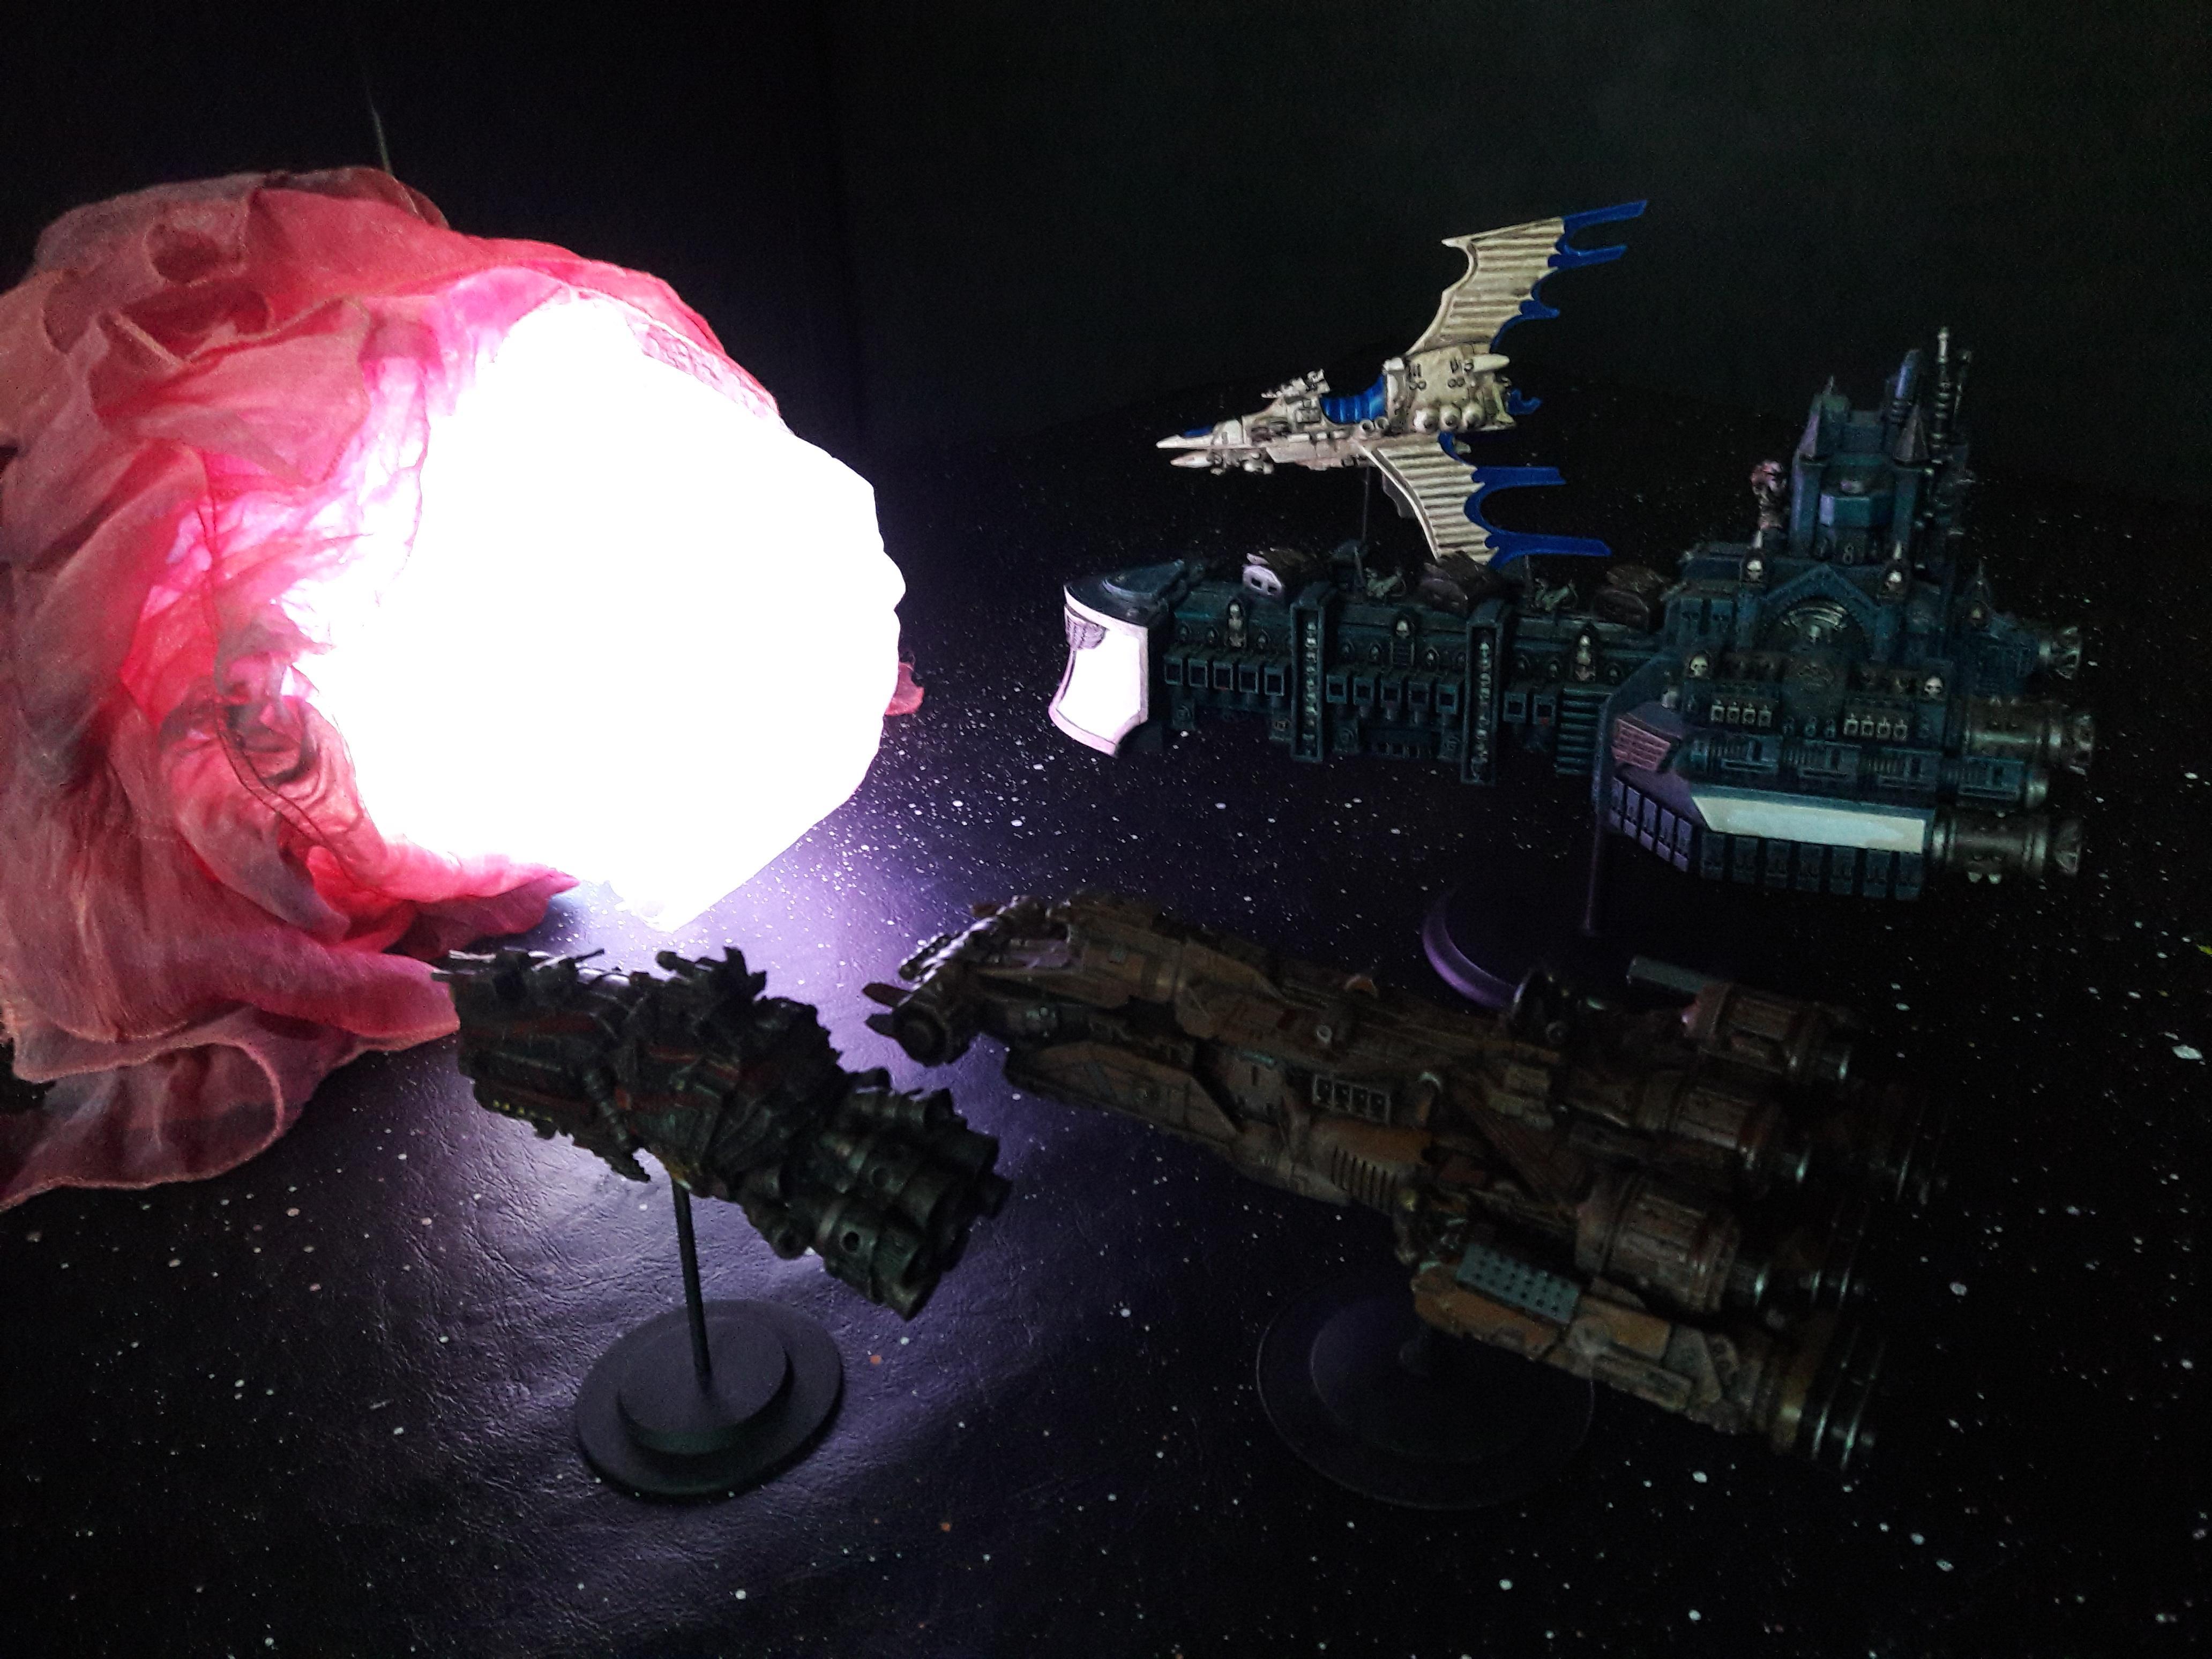 Necrons, Rogue Trader, Rpg, Tyranids, Warp